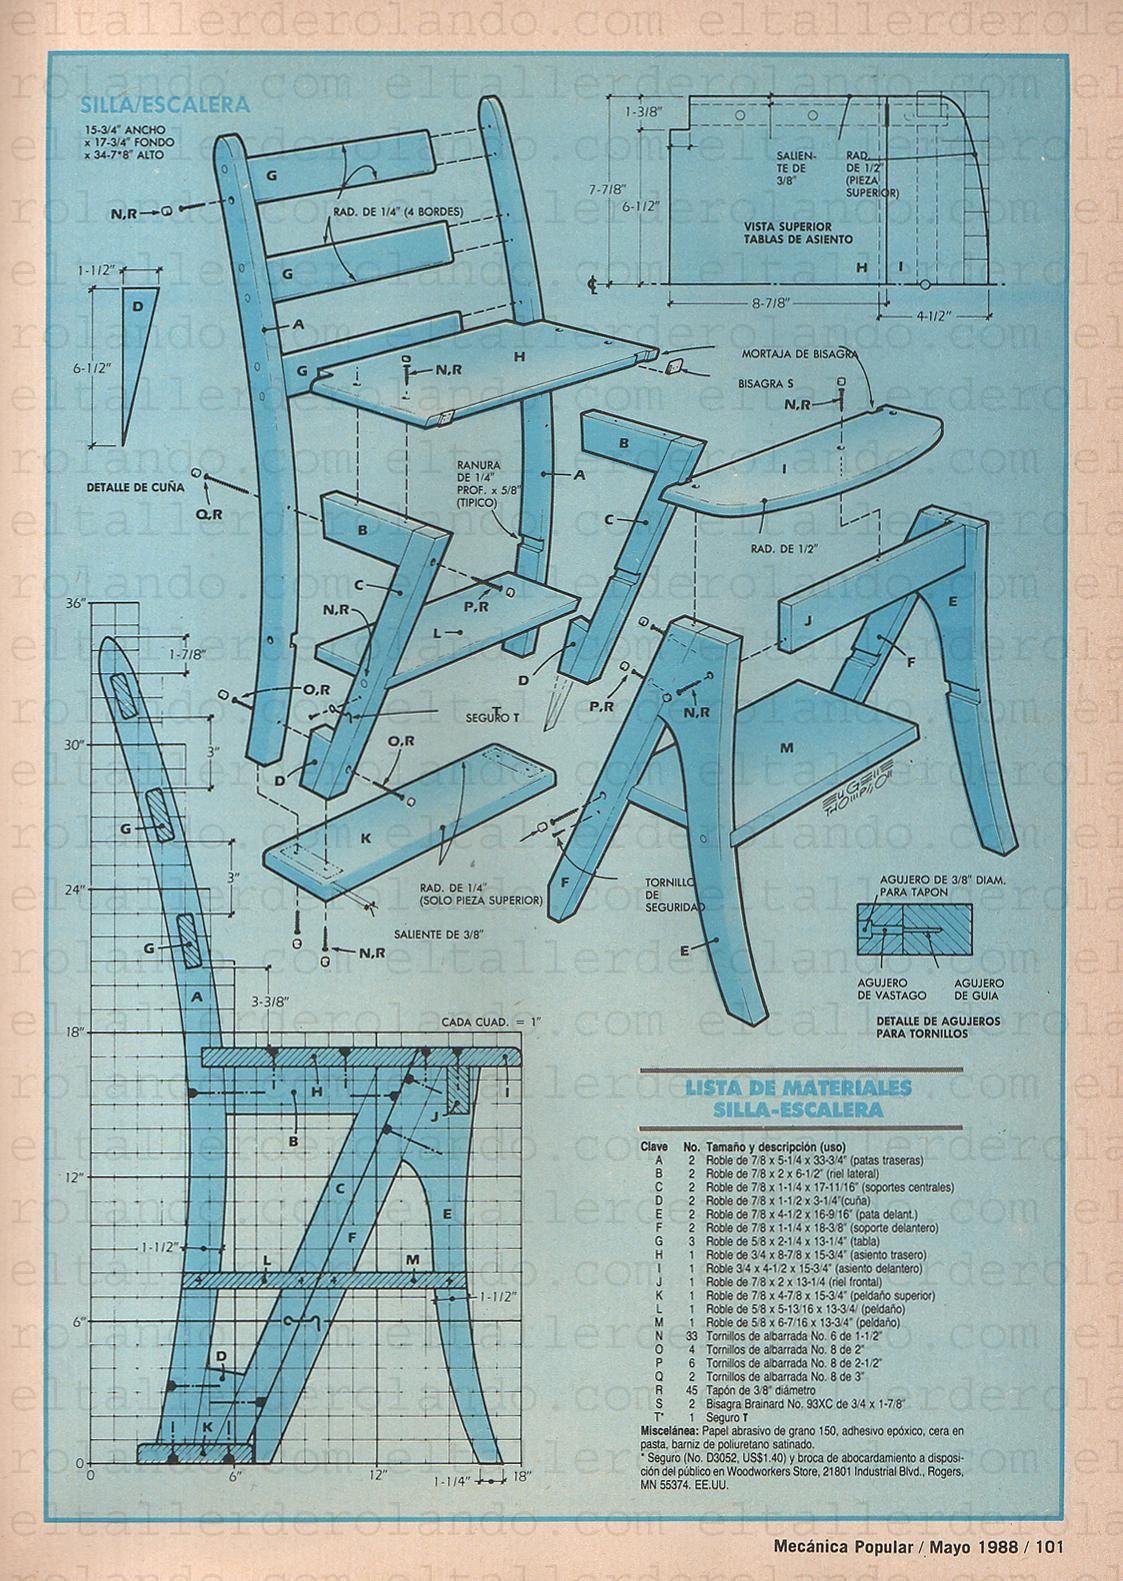 Util silla escalera mayo 1988 004 copia love it en 2019 for Silla escalera de madera